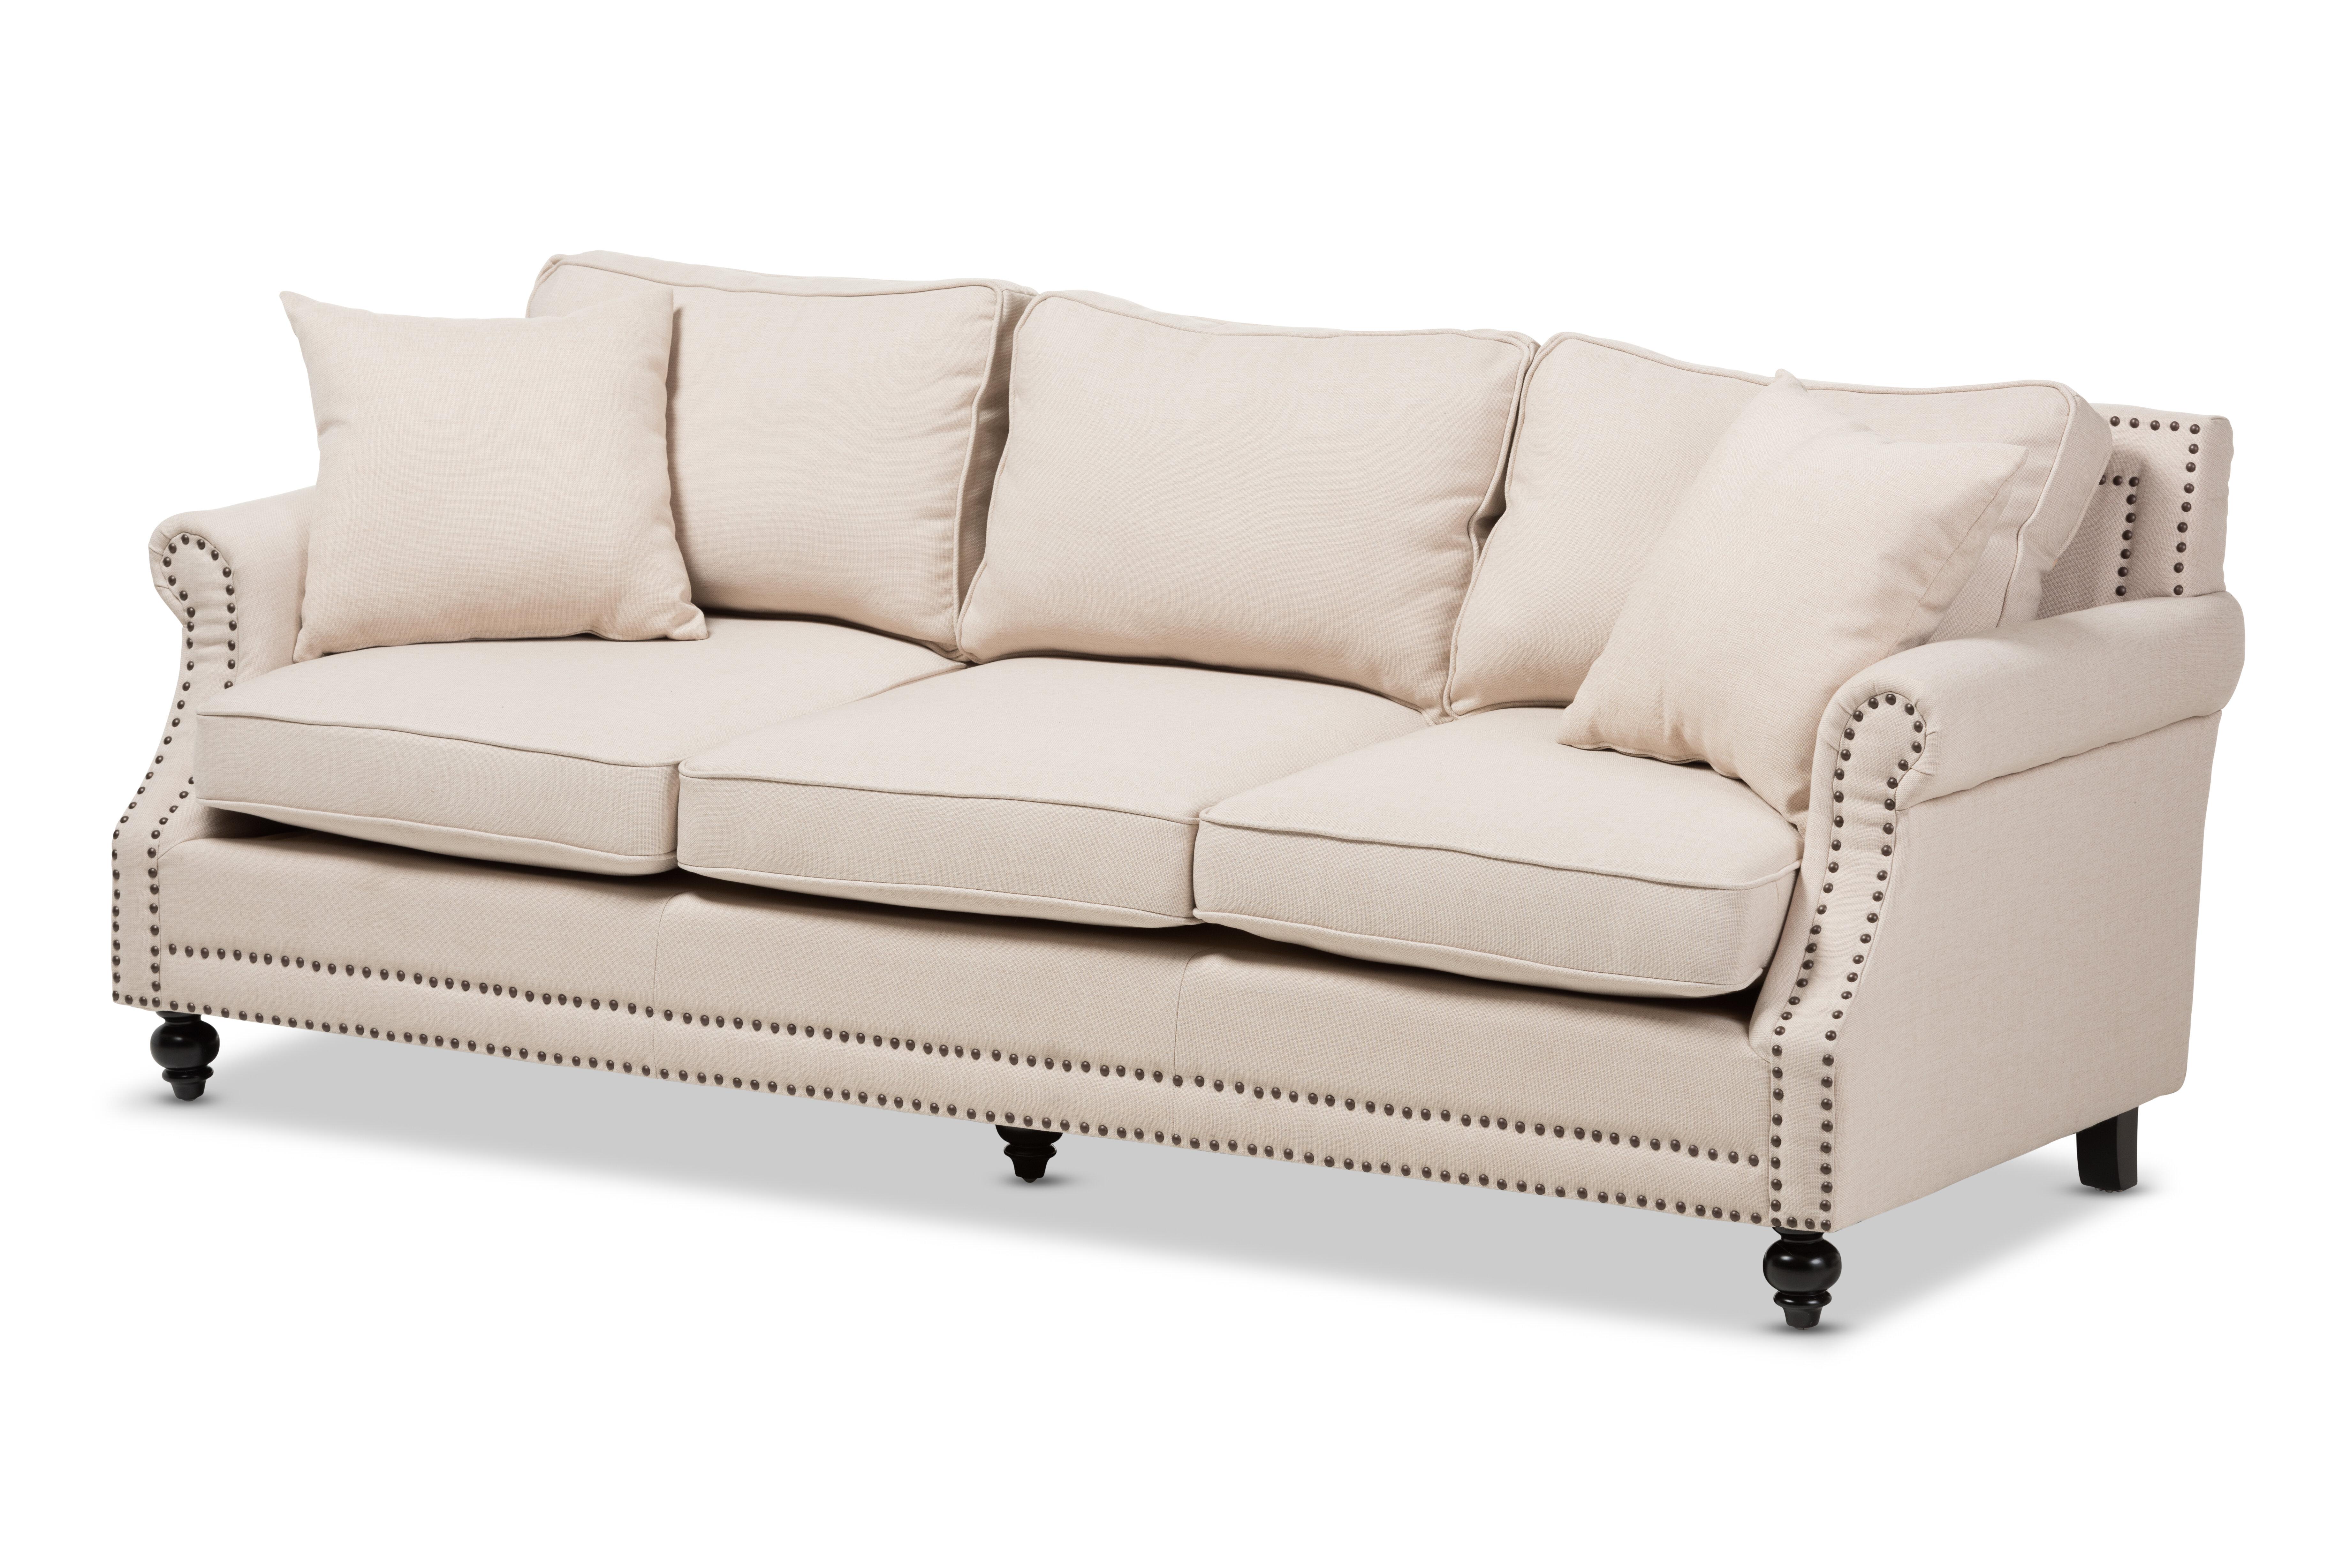 Great Wholesale Interiors Baxton Studio Mckenna Sofa U0026 Reviews | Wayfair